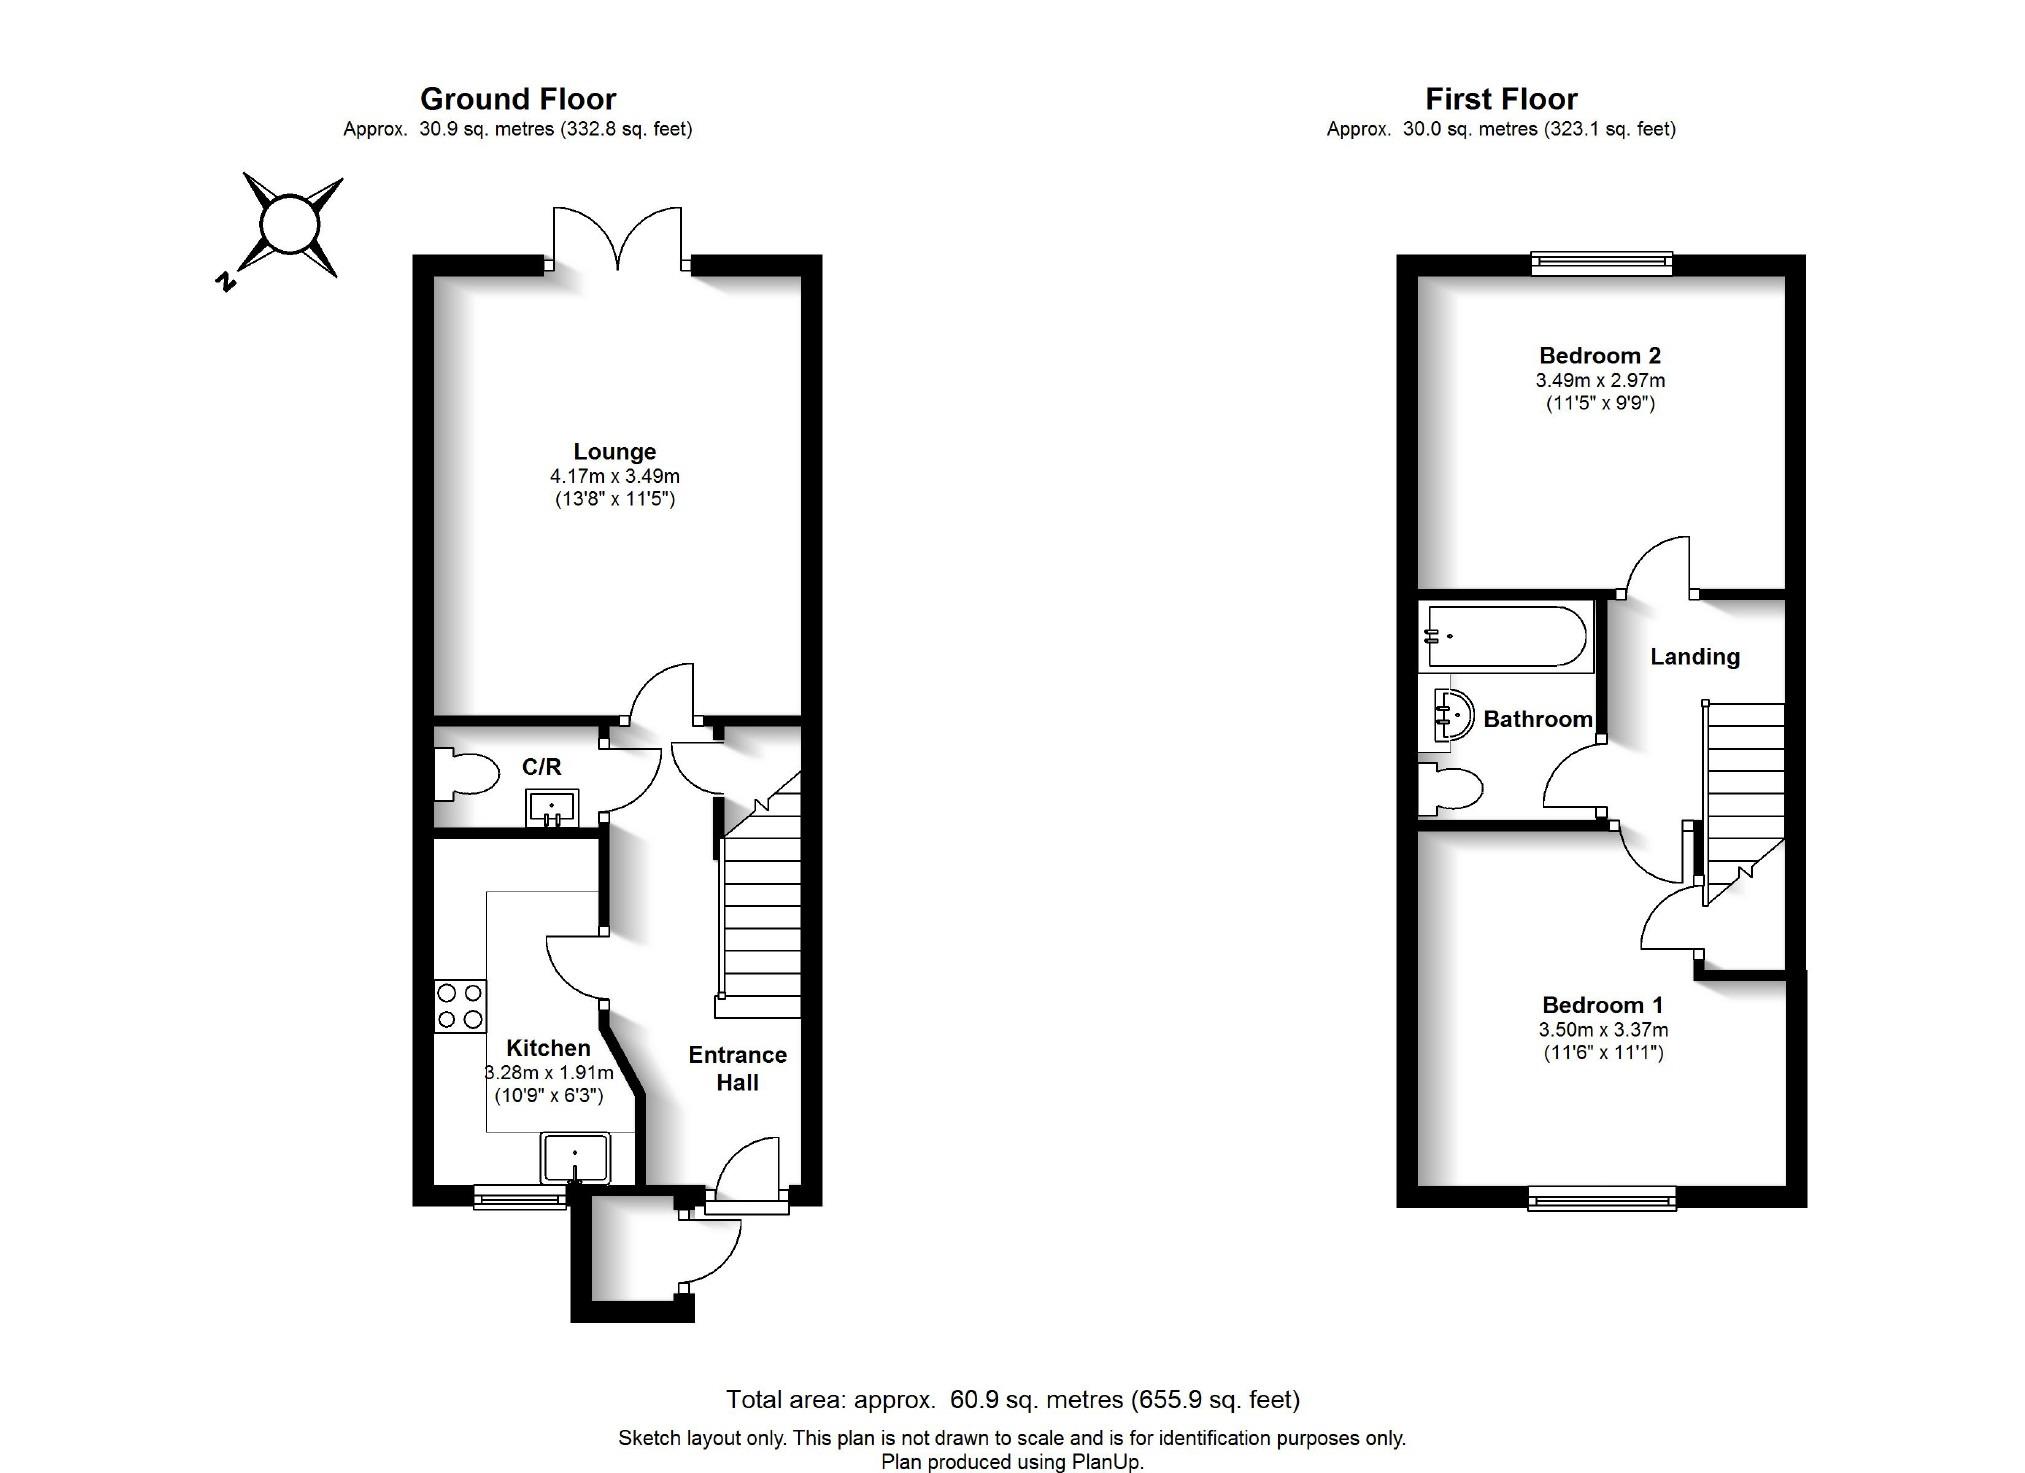 Ennerdale Drive, Watford WD25, 2 bedroom terraced house to